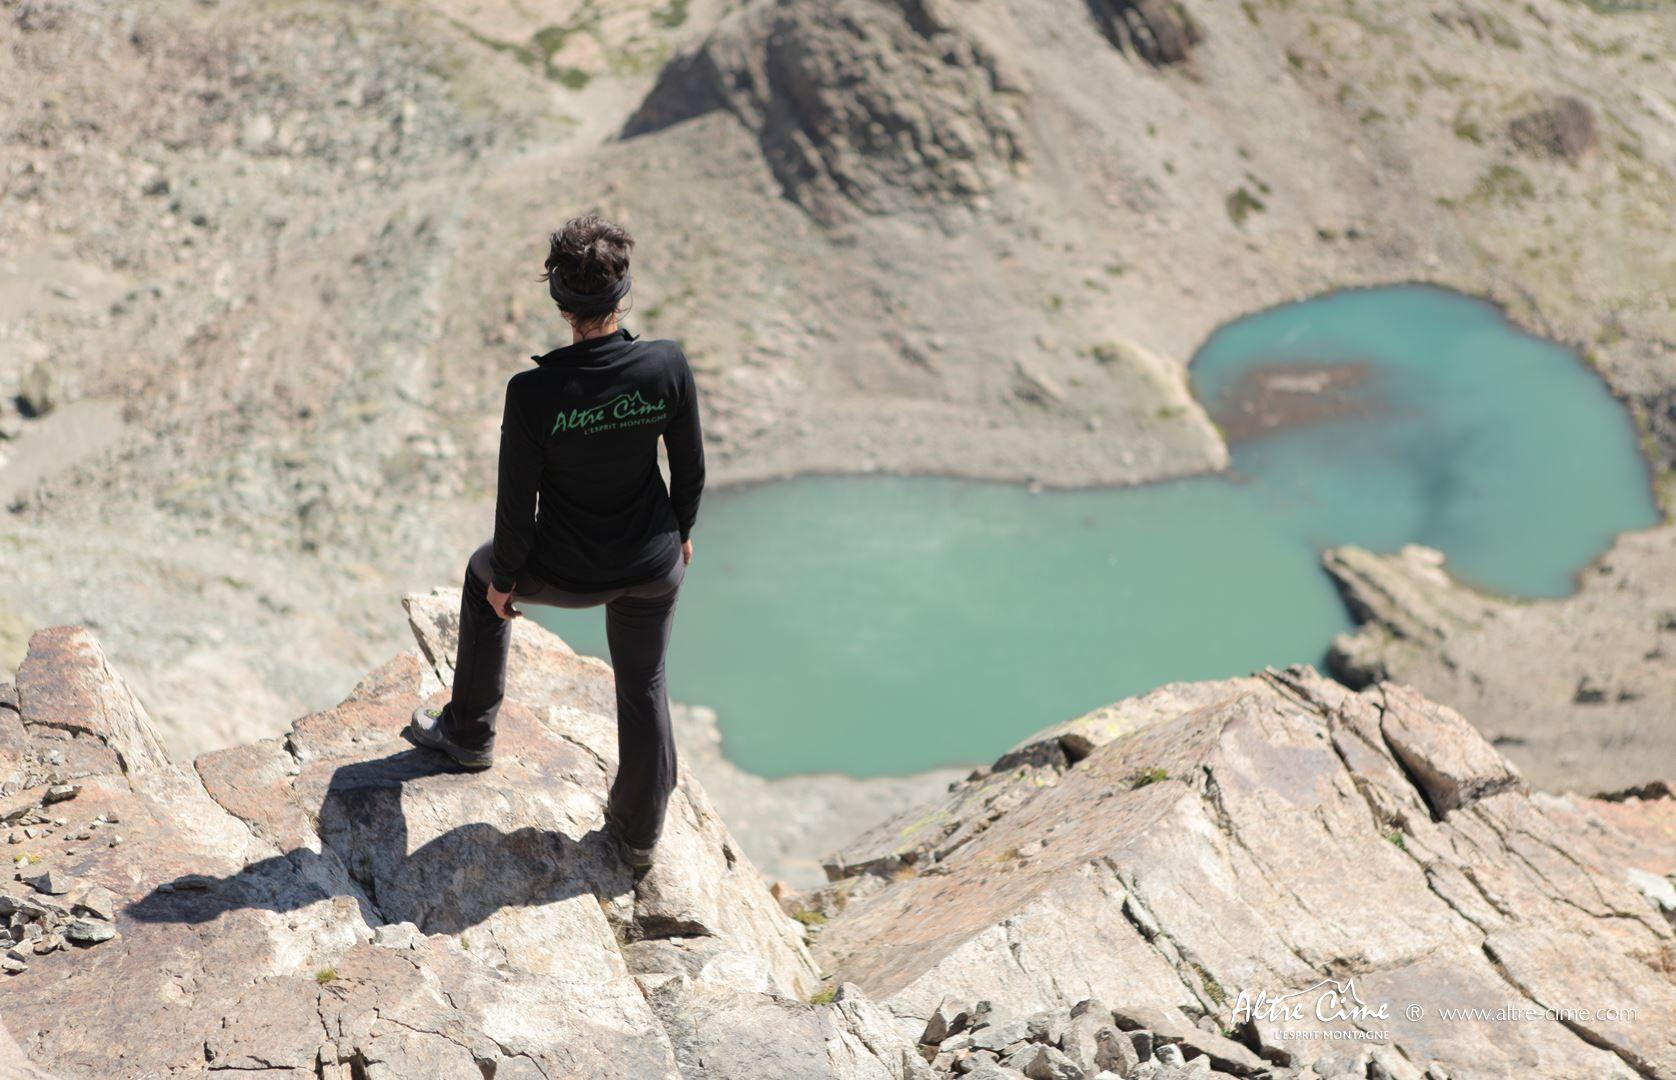 [Randonnée Corse Sauvage] Lac Maïo